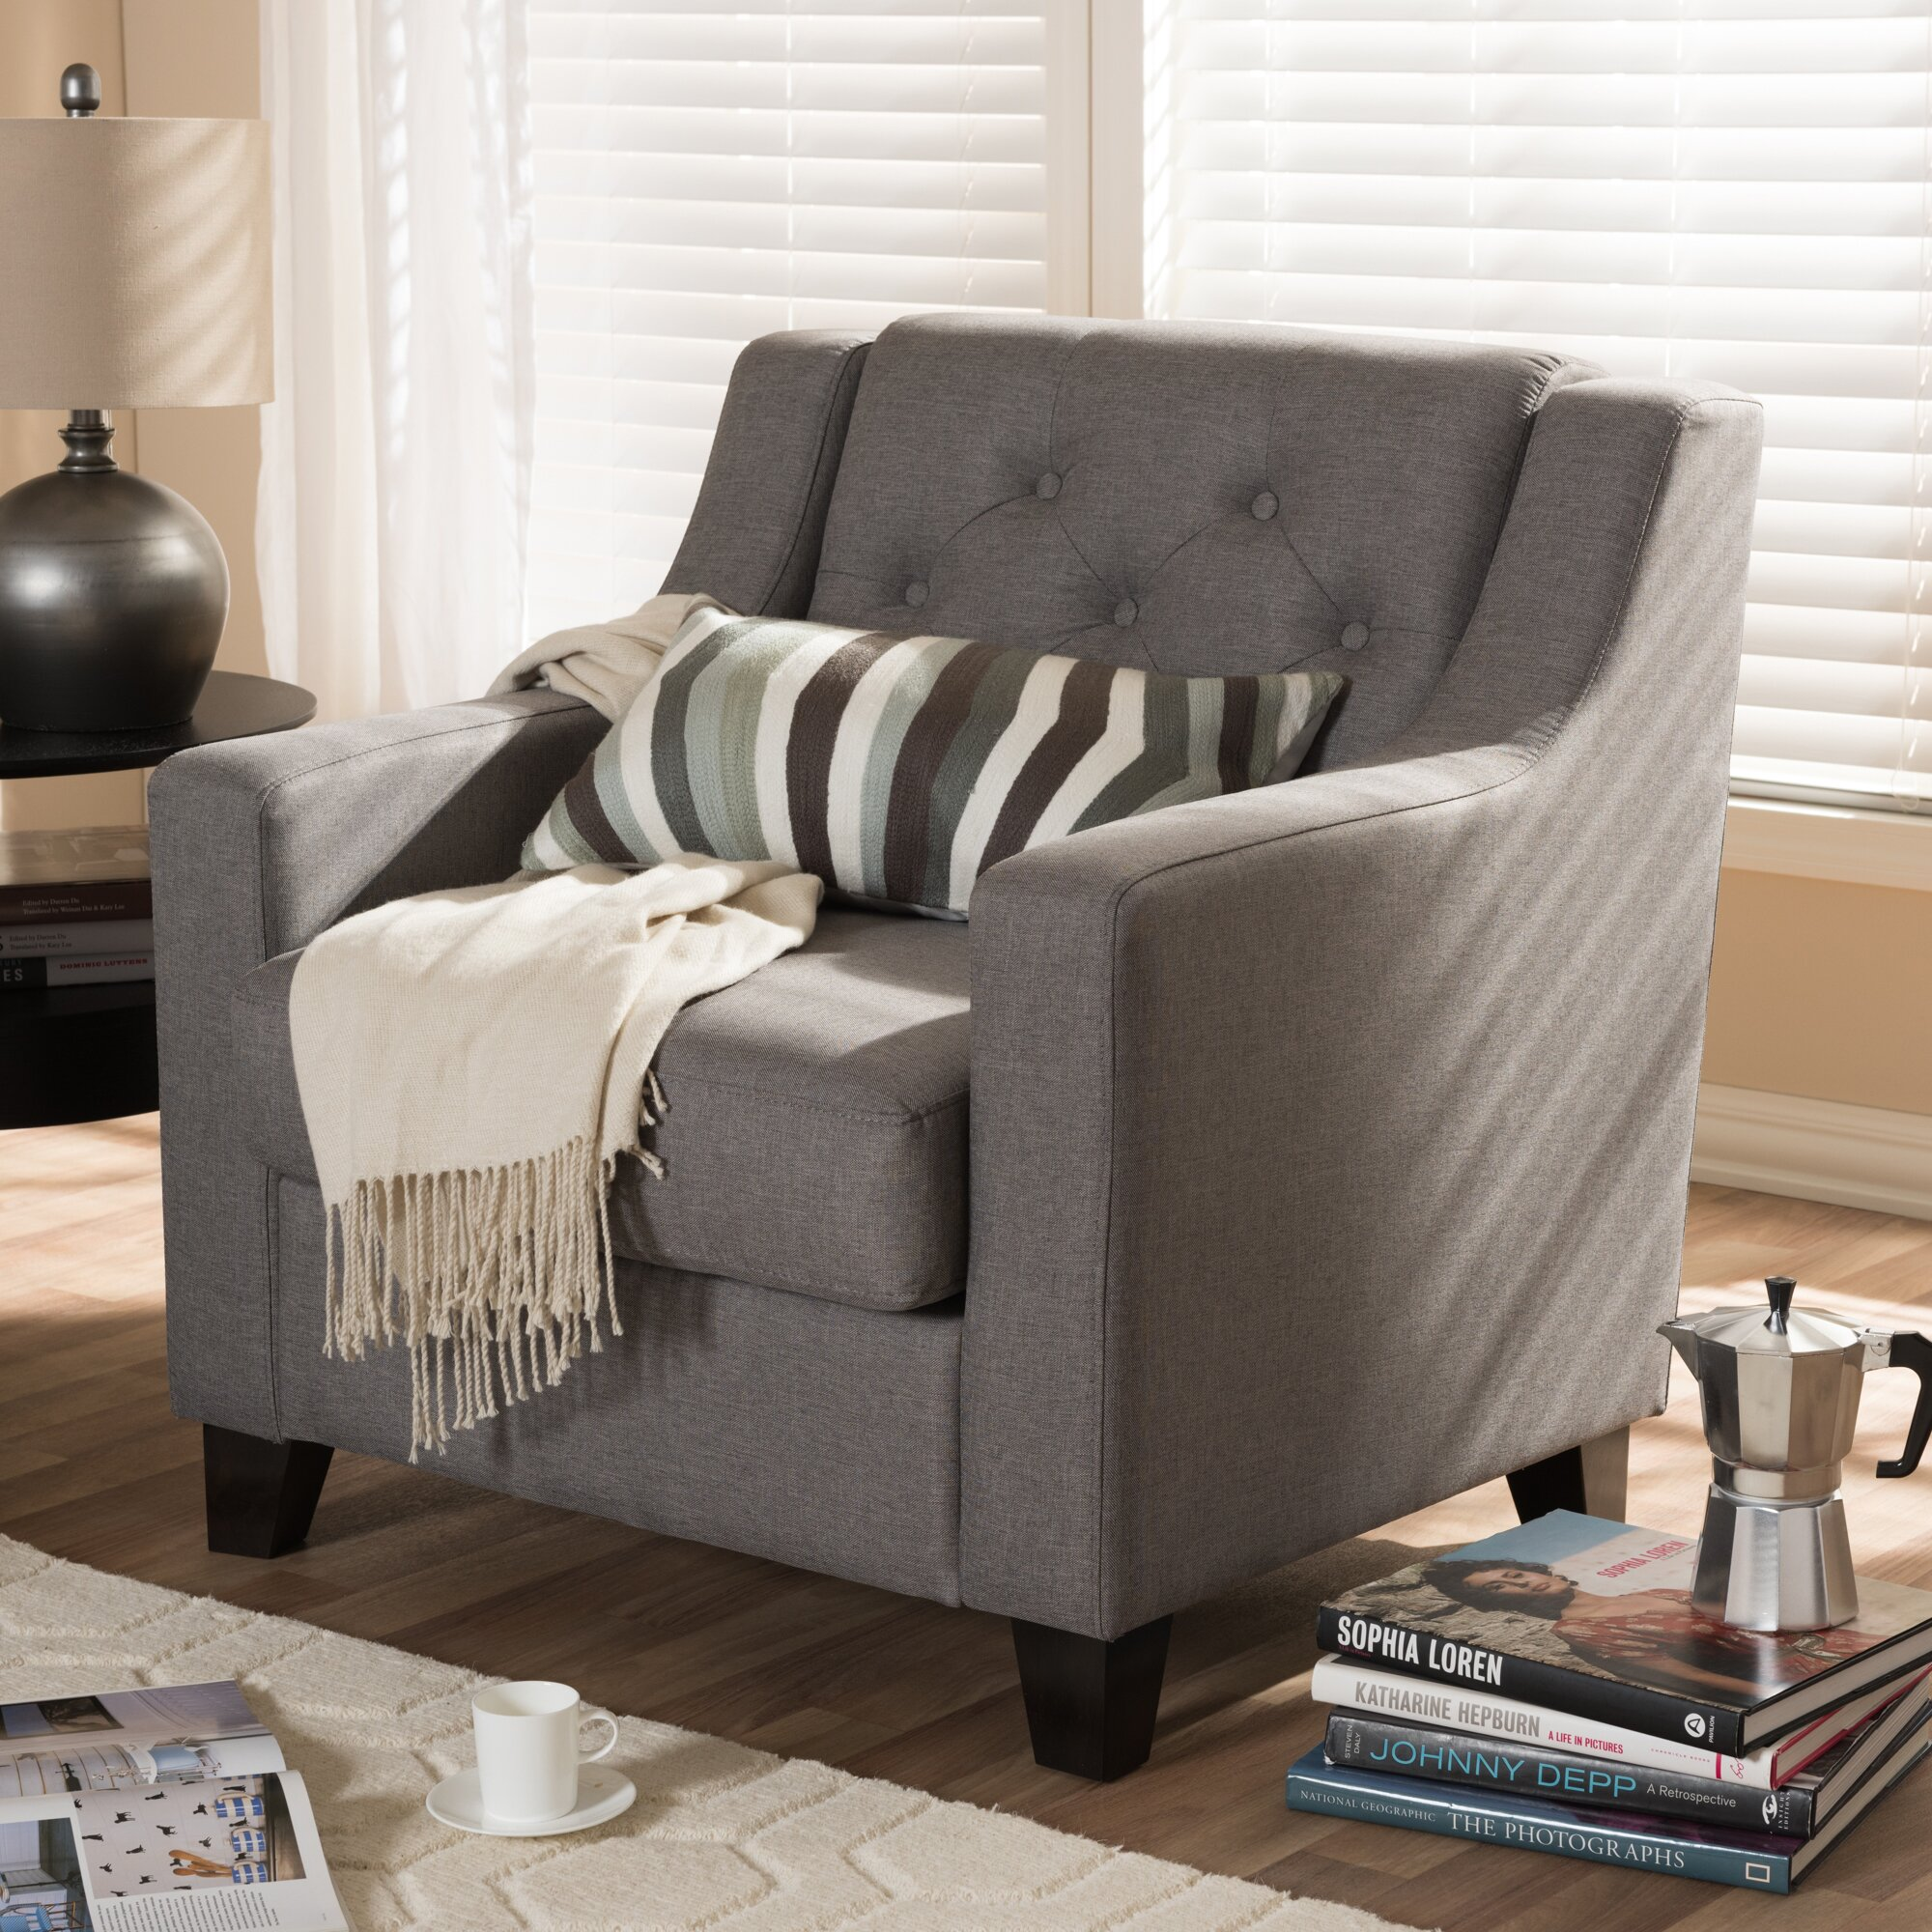 Living Room 3 Piece Sets Wholesale Interiors Baxton Studio Silvia 3 Piece Living Room Sofa